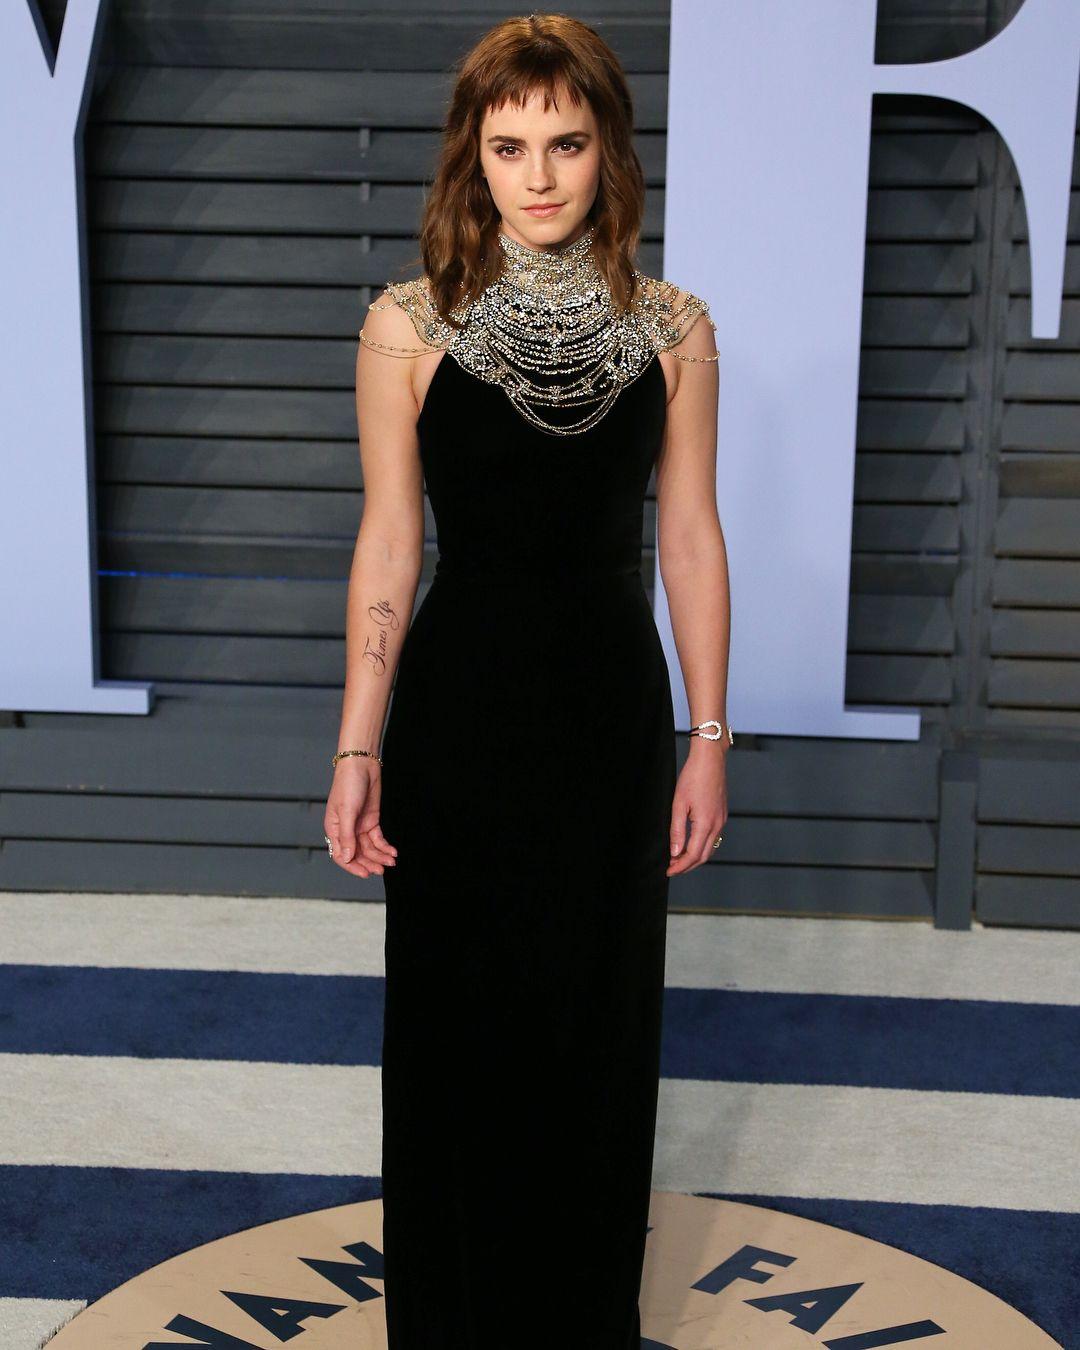 Emma Watson Wearing Ralph Lauren Collection At The Vanity